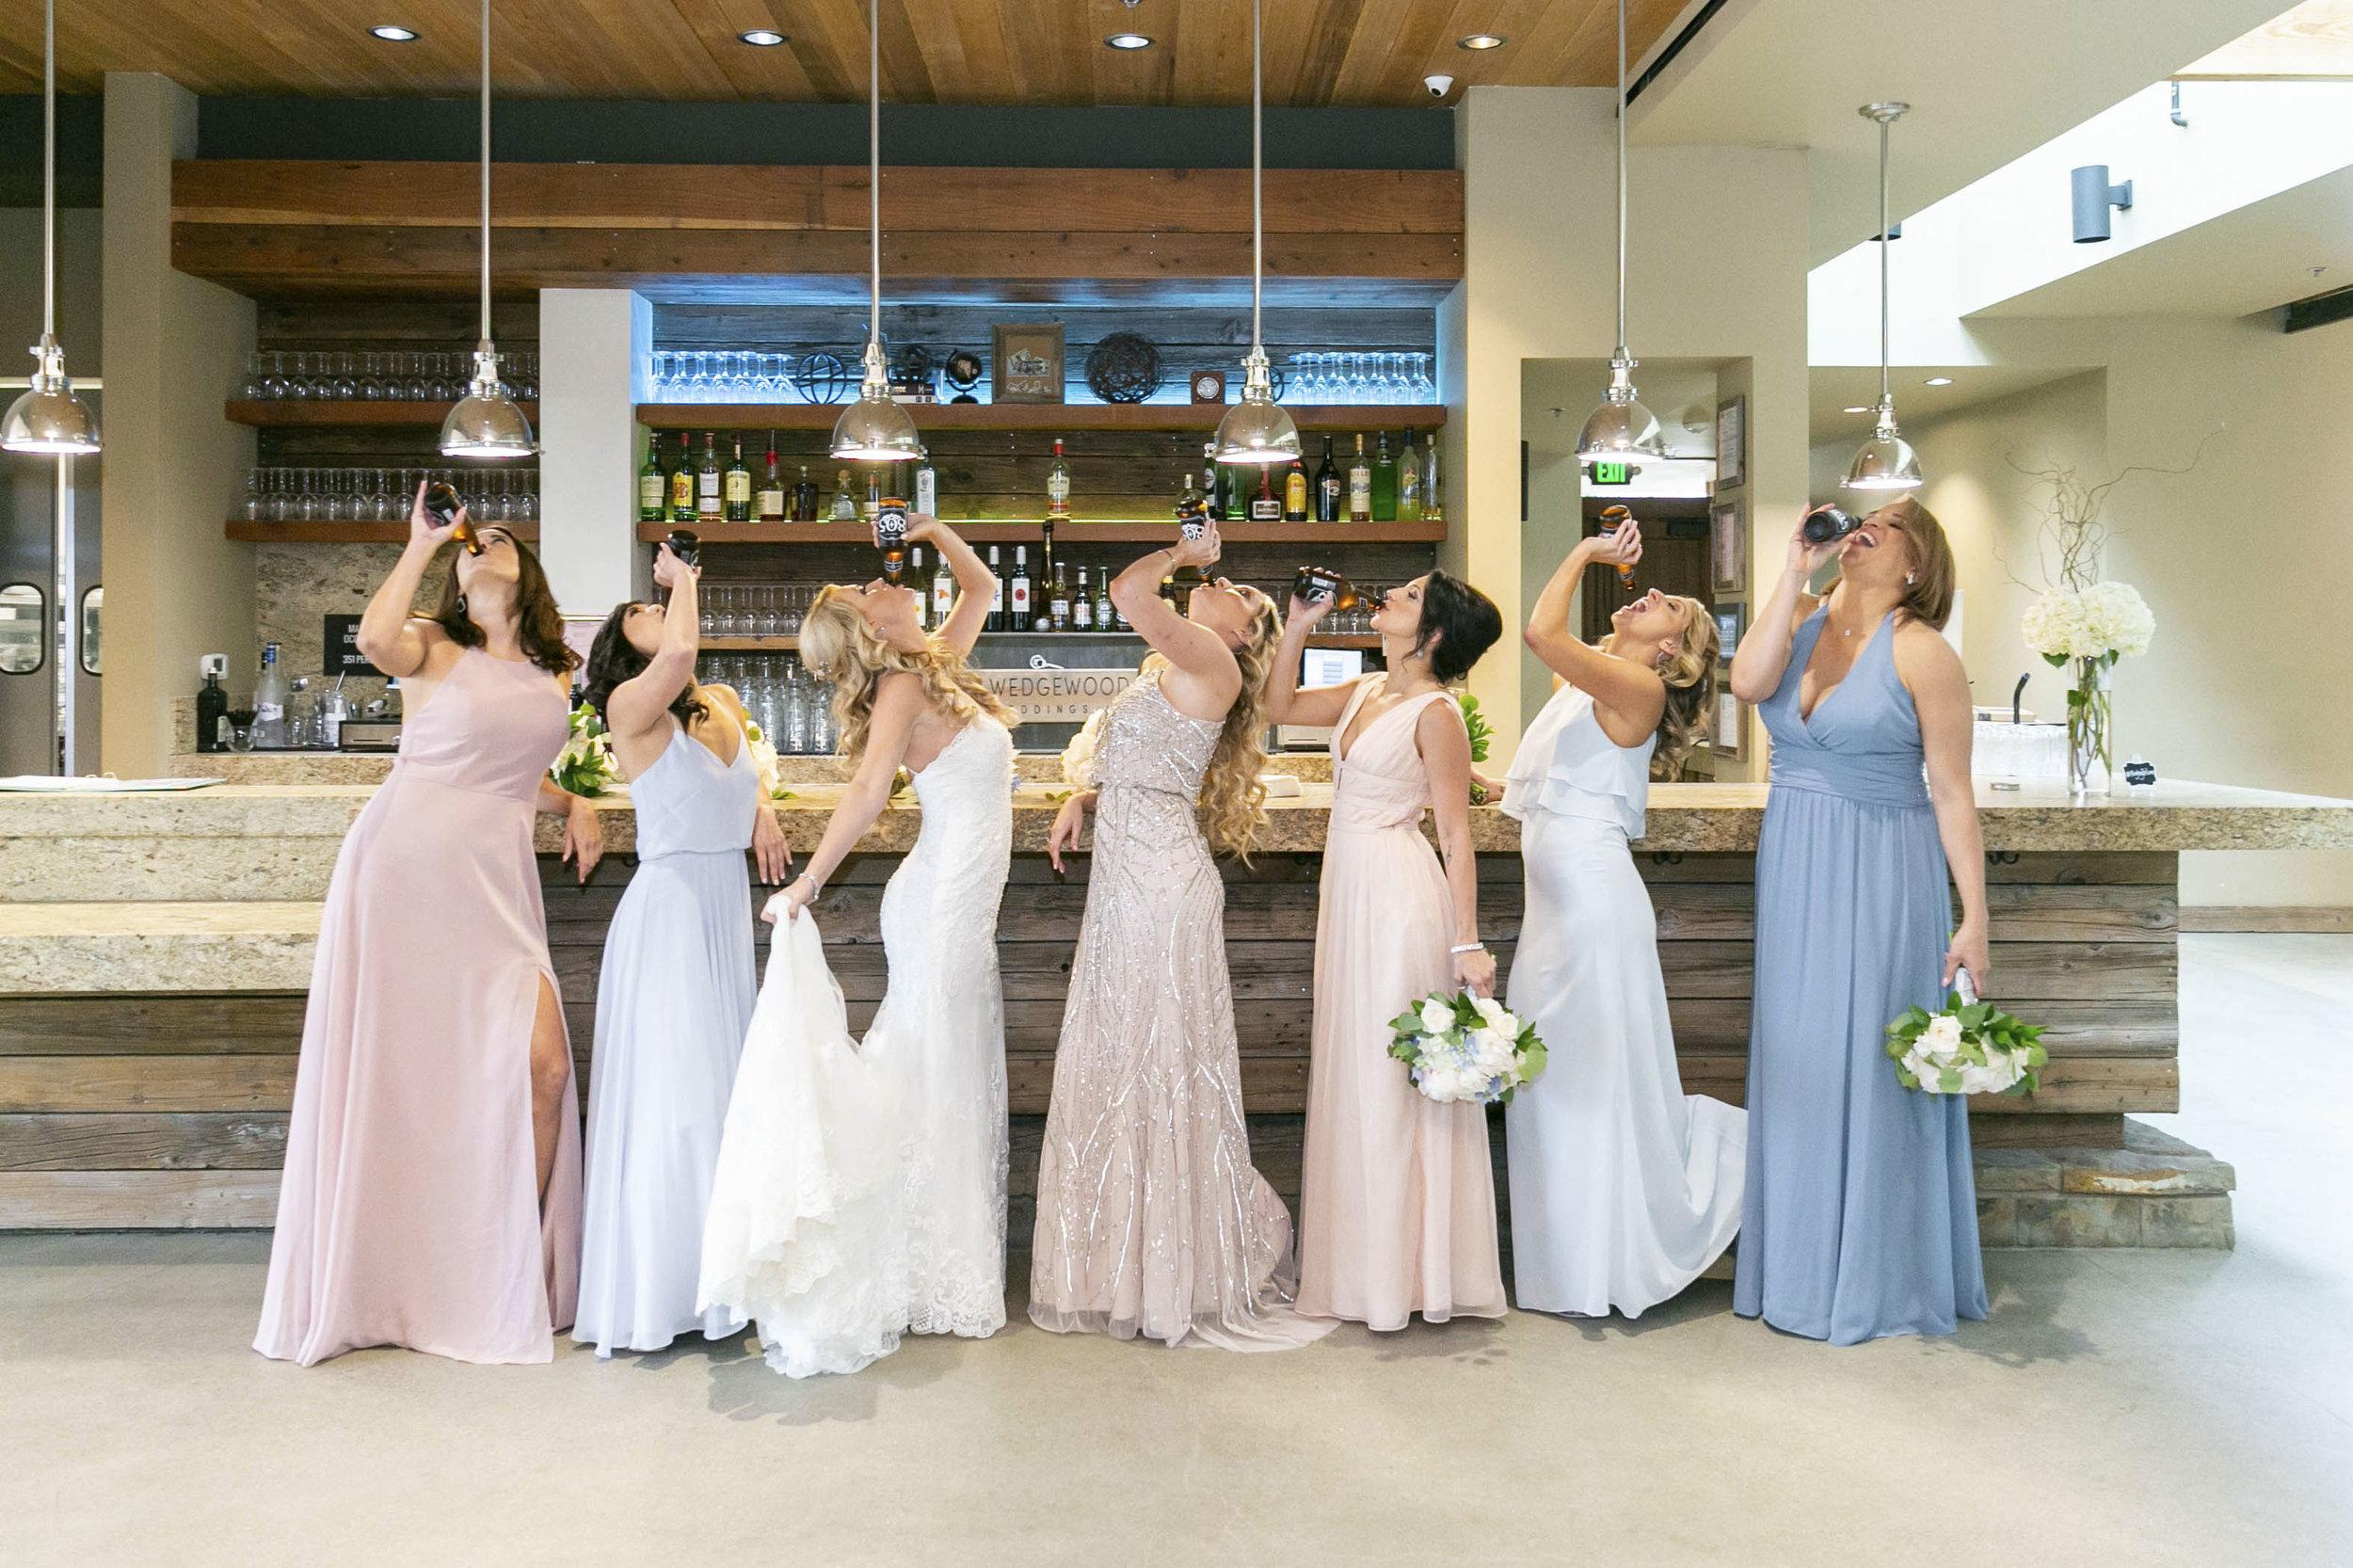 Domenica Beauty _ Hair and Makeup Artist _Wedding _ Temecula, CA Wedding _ Briana and Samuel _ 29.JPG